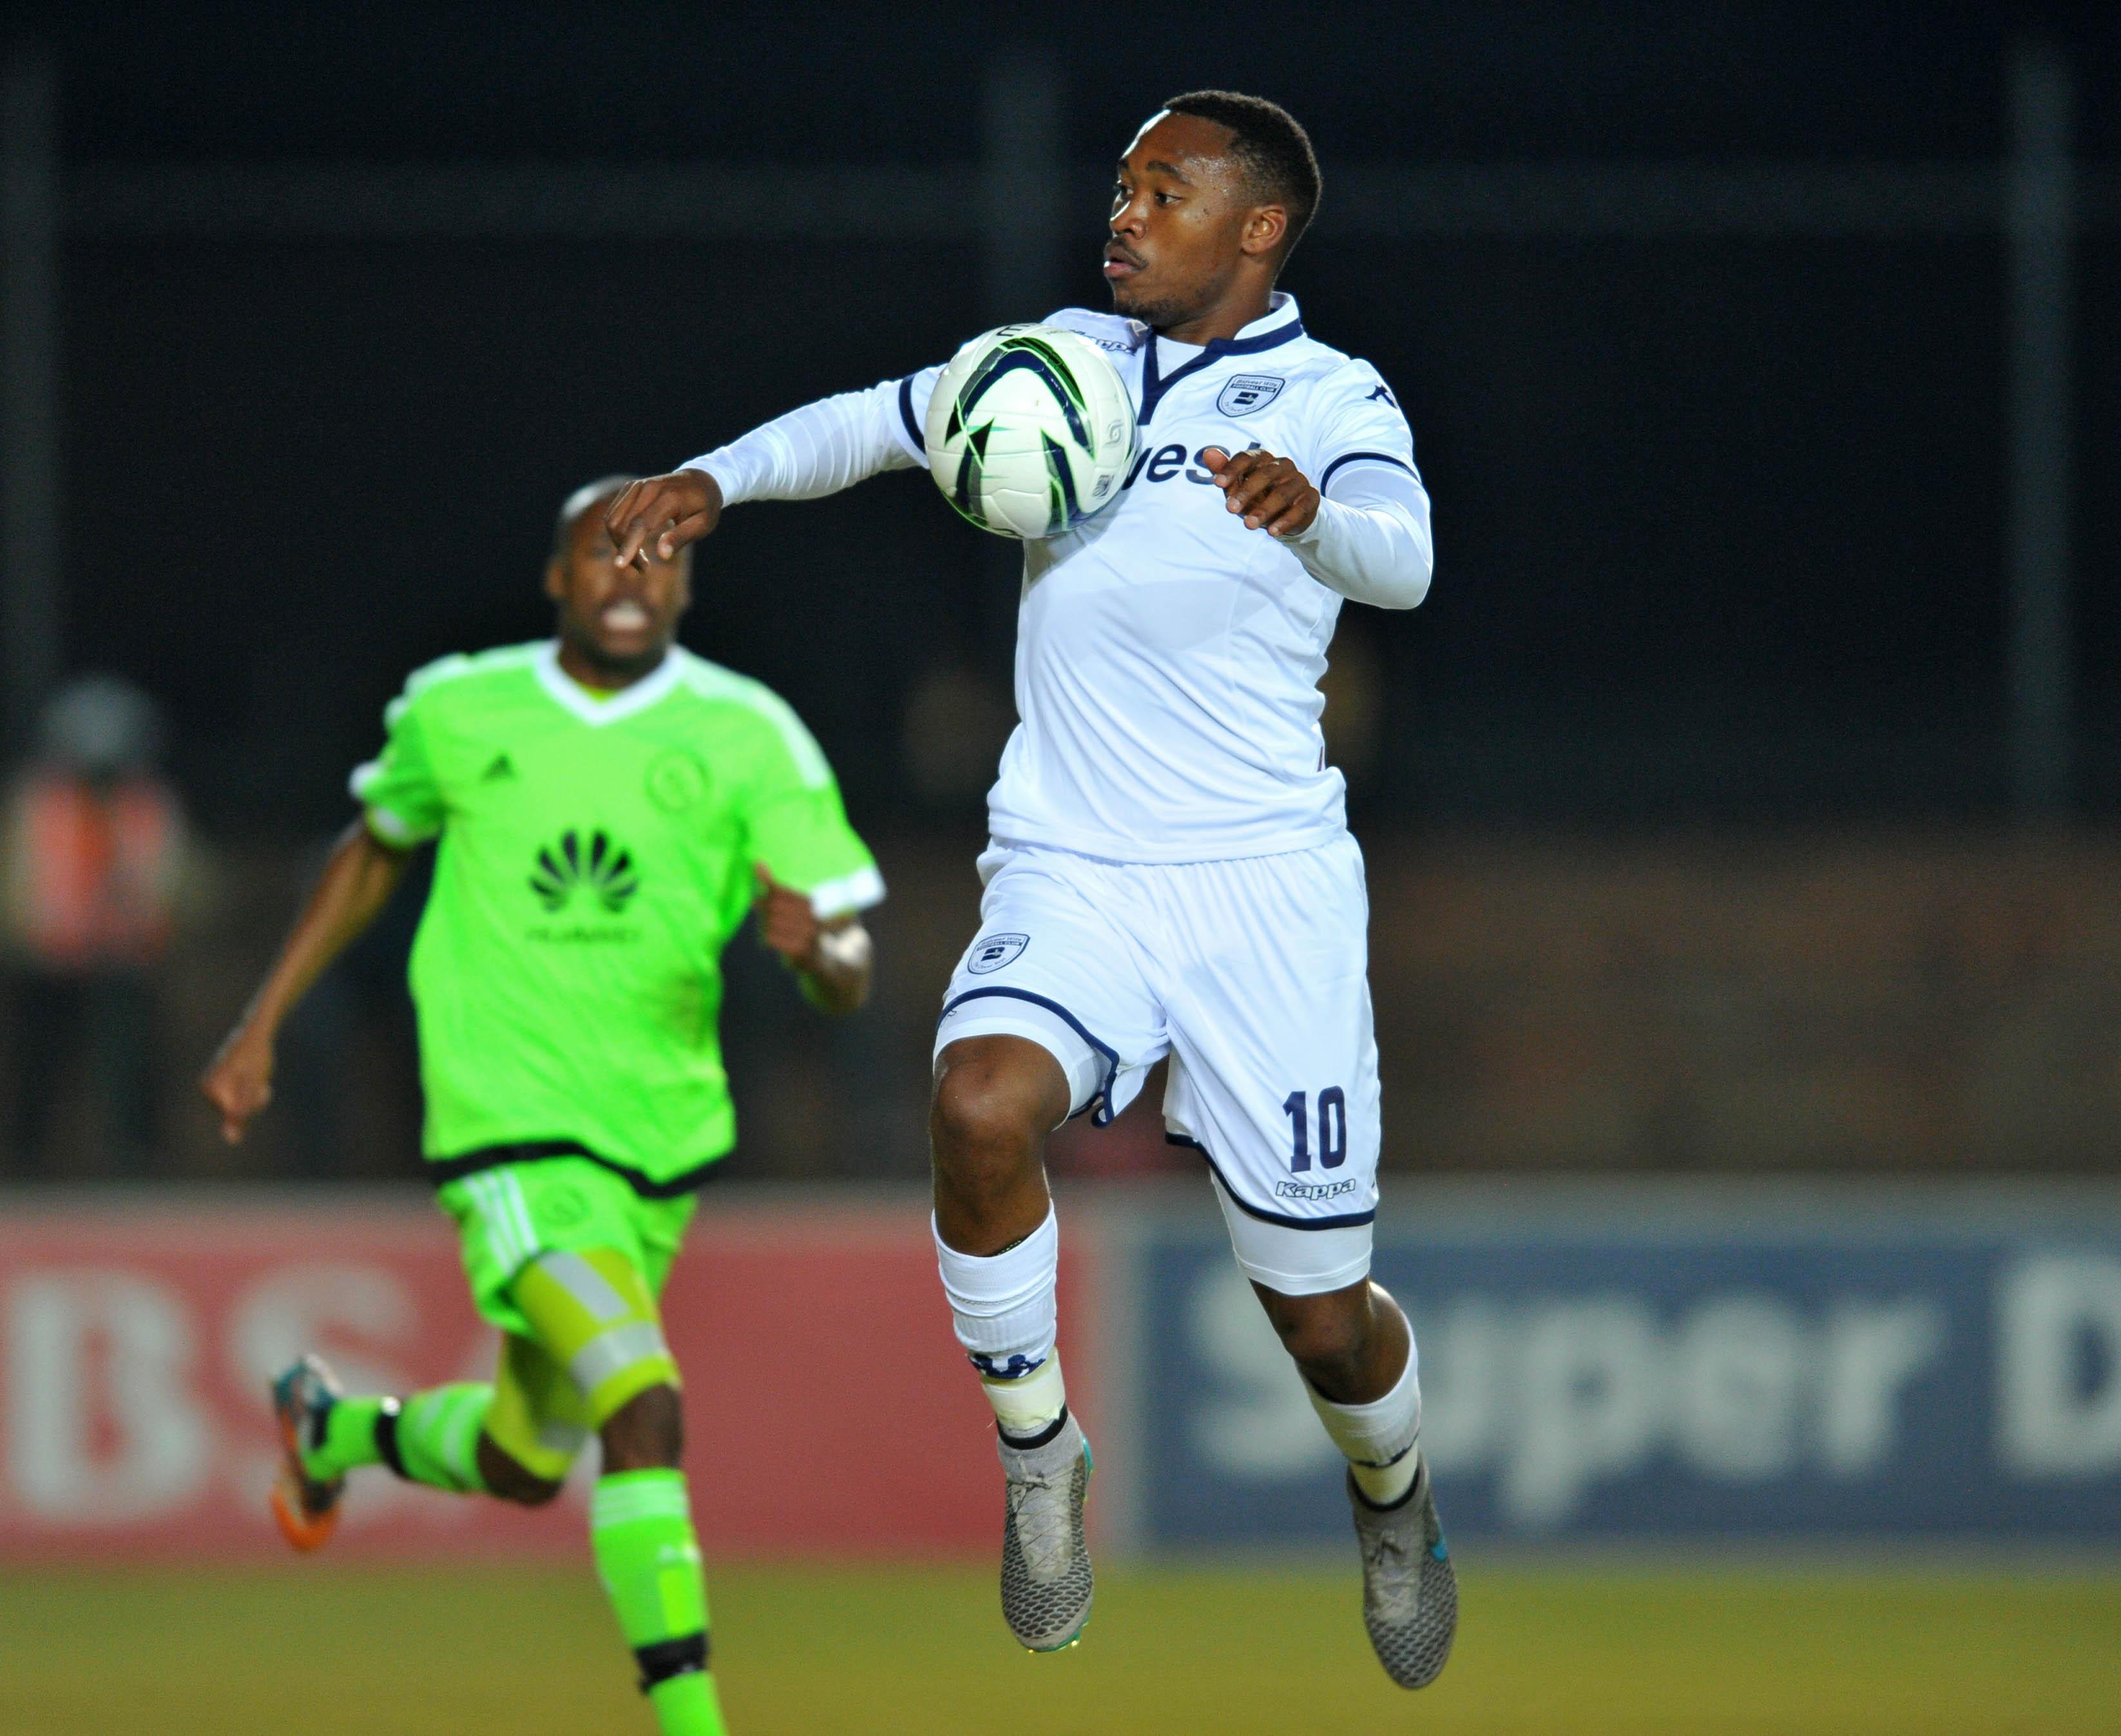 Sibusiso Vilakazi of Bidvest Wits challenged by Bantu Mzwakali of Ajax Cape Town (Samuel Shivambu/BackpagePix)